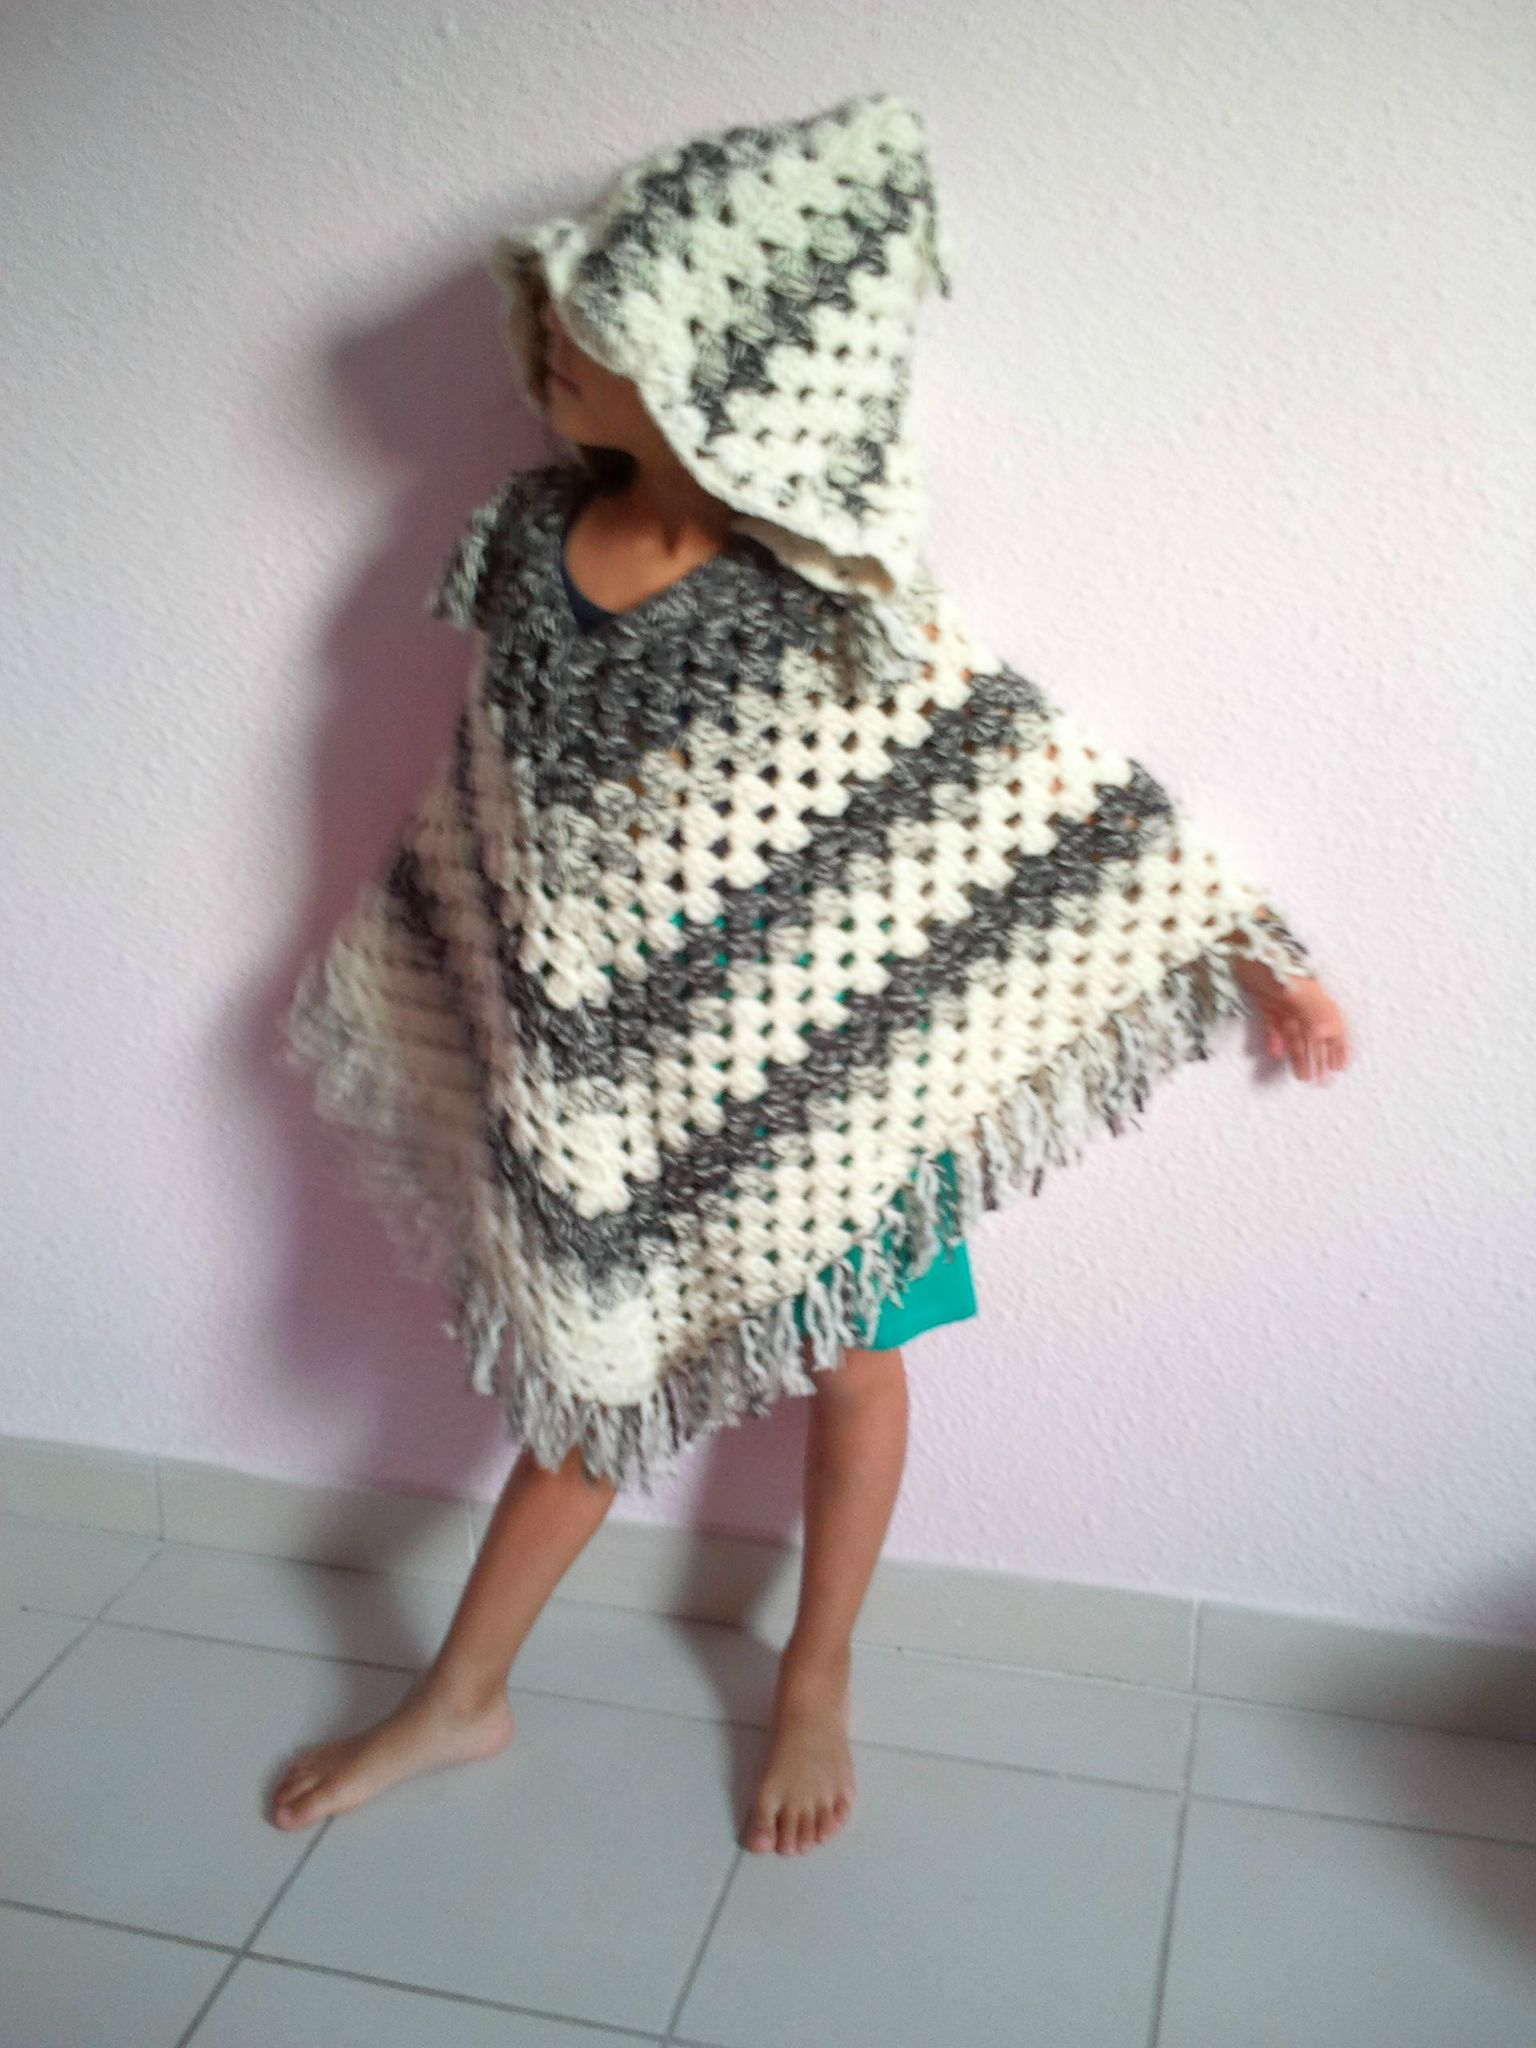 Options binaires tuto crochet poncho * ucivexe.web.fc2.com